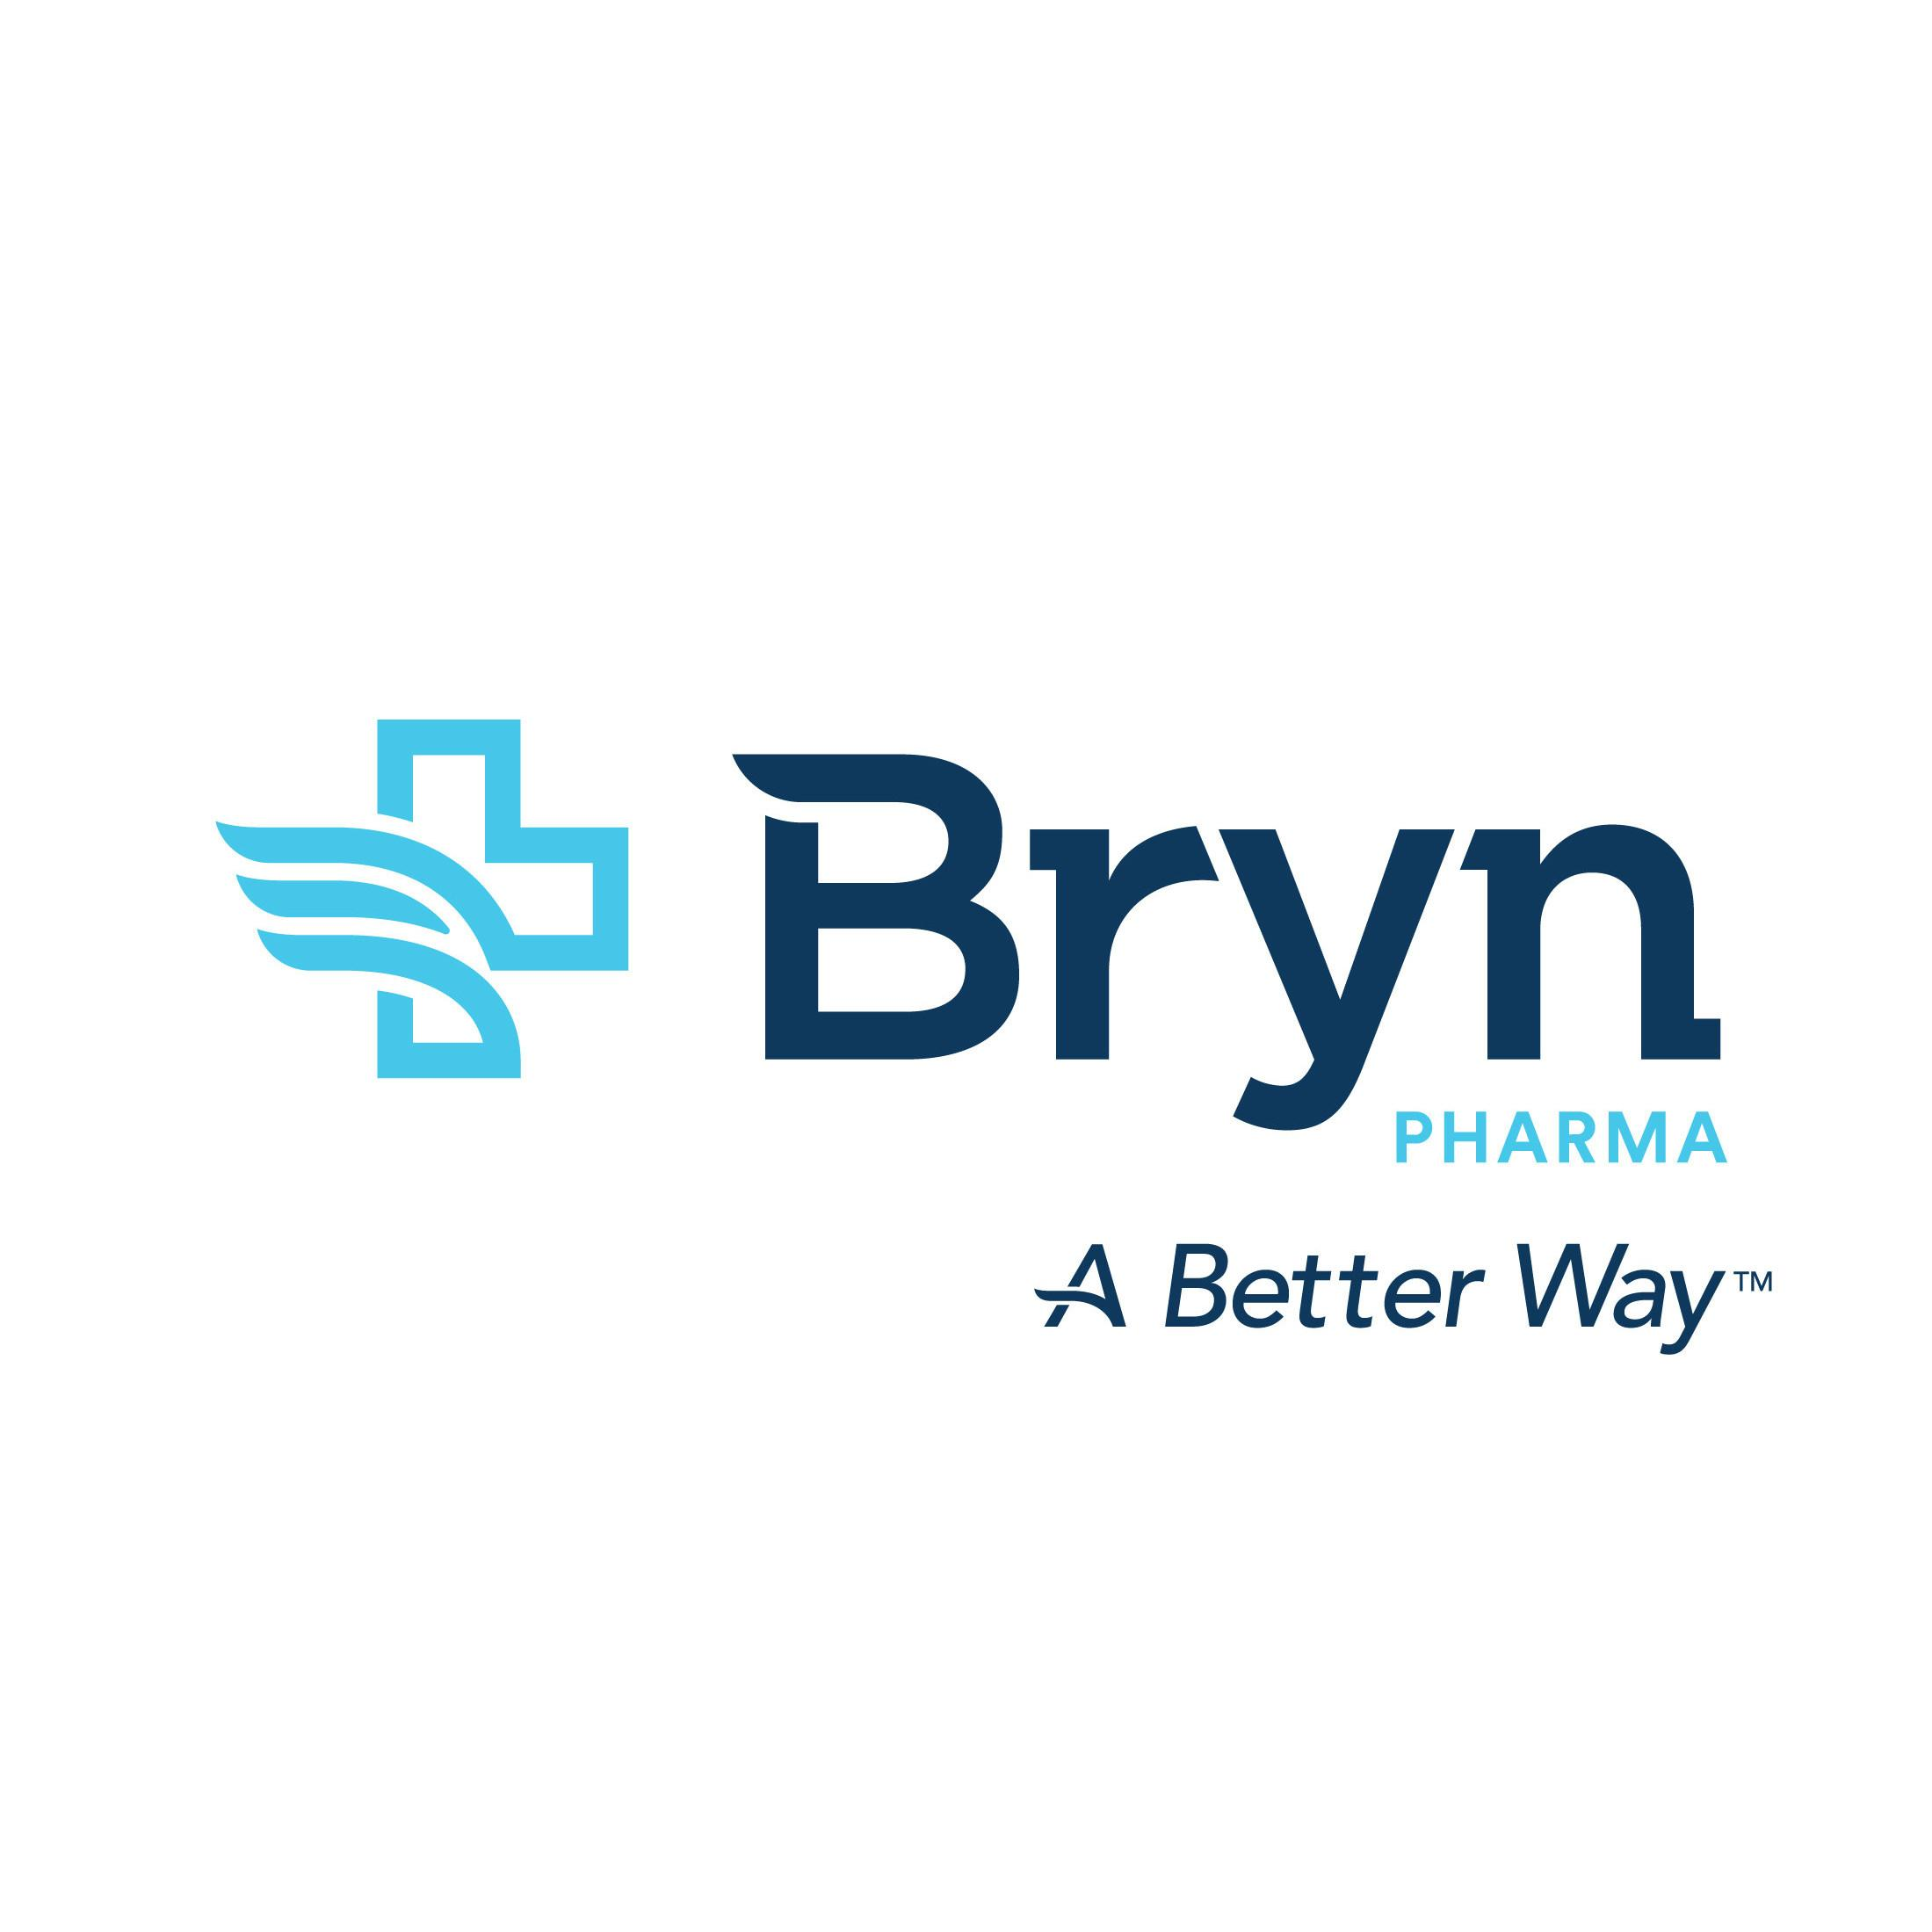 Bryn Pharma company logo